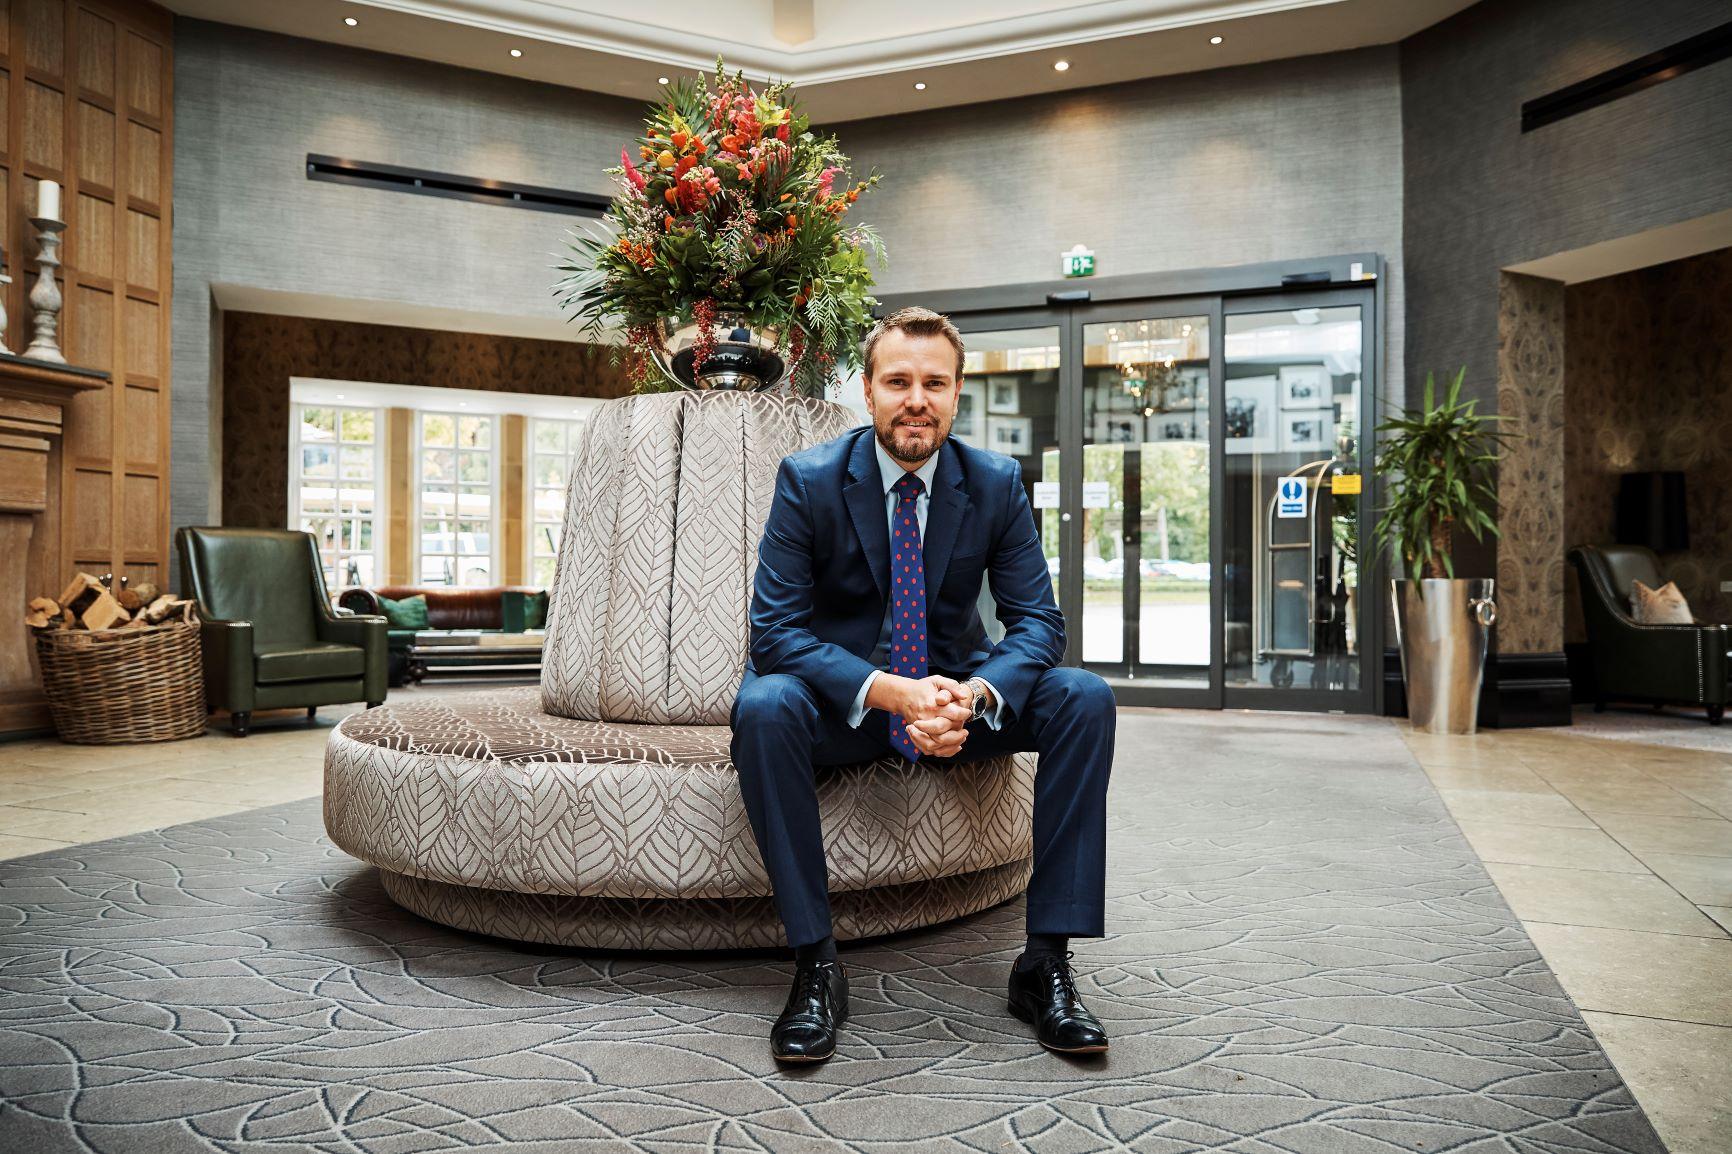 Chris Eigelaar, Resort General Manager at The Belfry Hotel & Resort